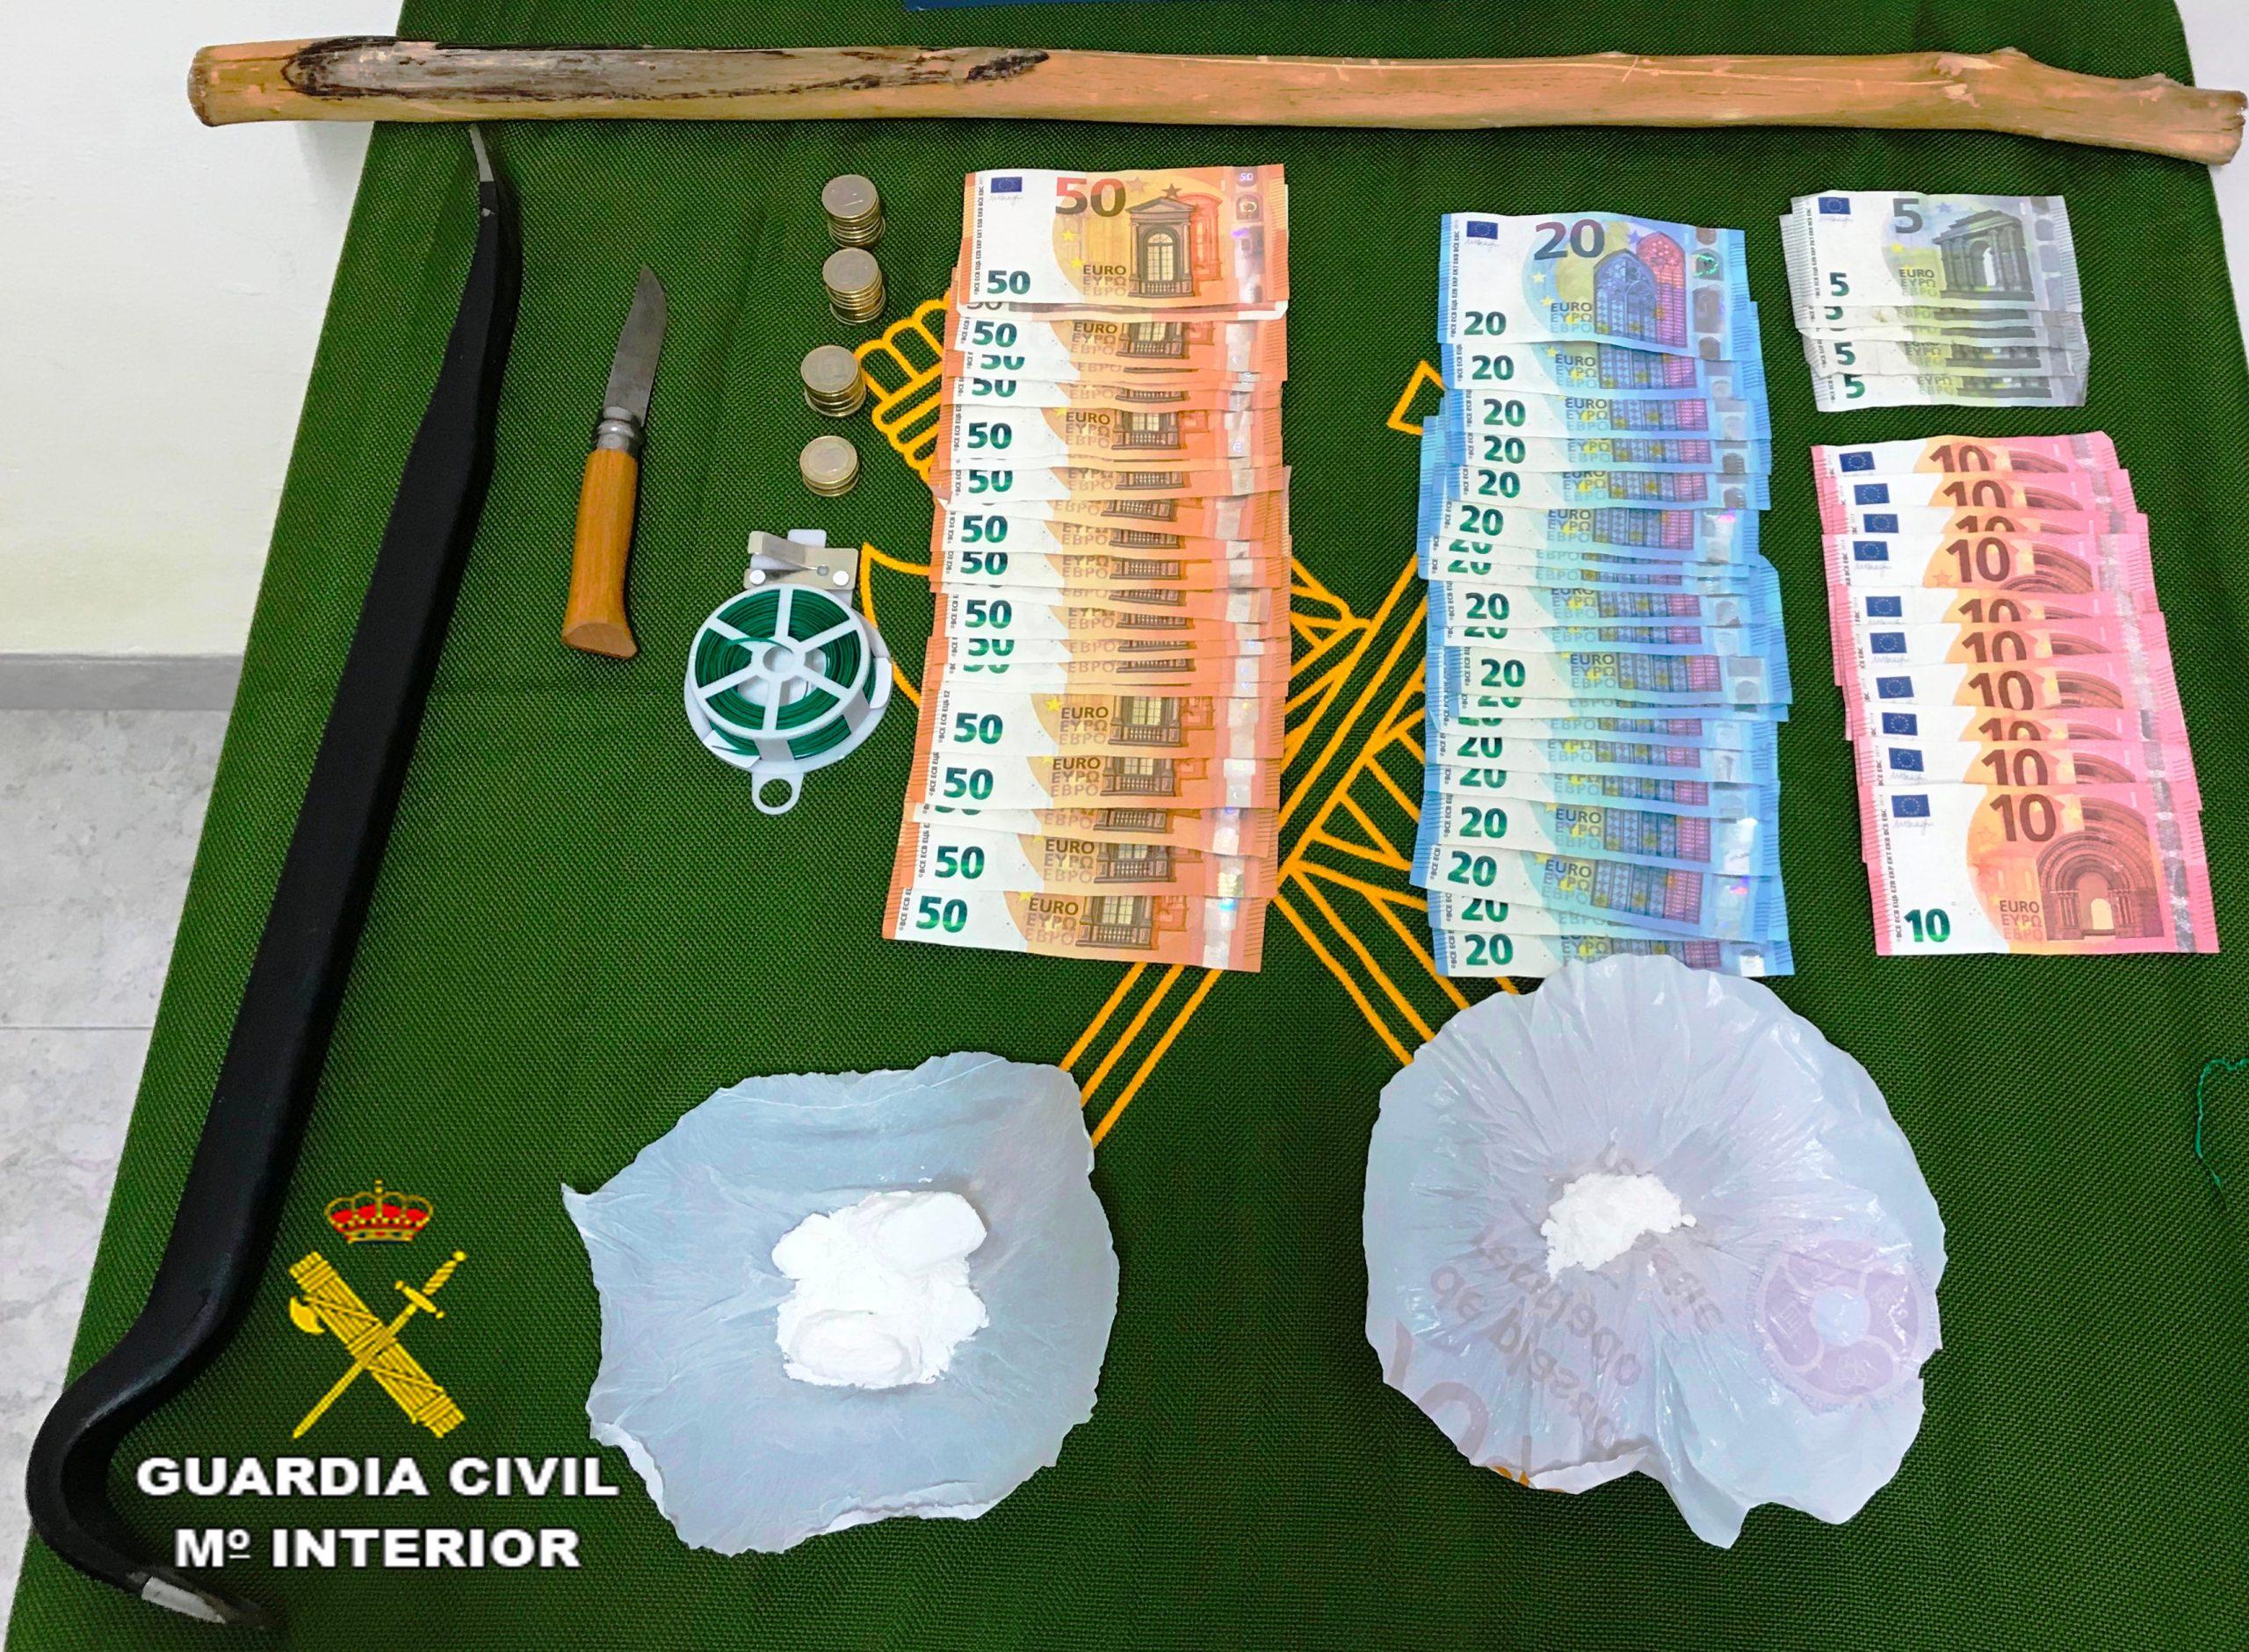 La Guardia Civil desarticula un punto de venta de droga en Torreblanca